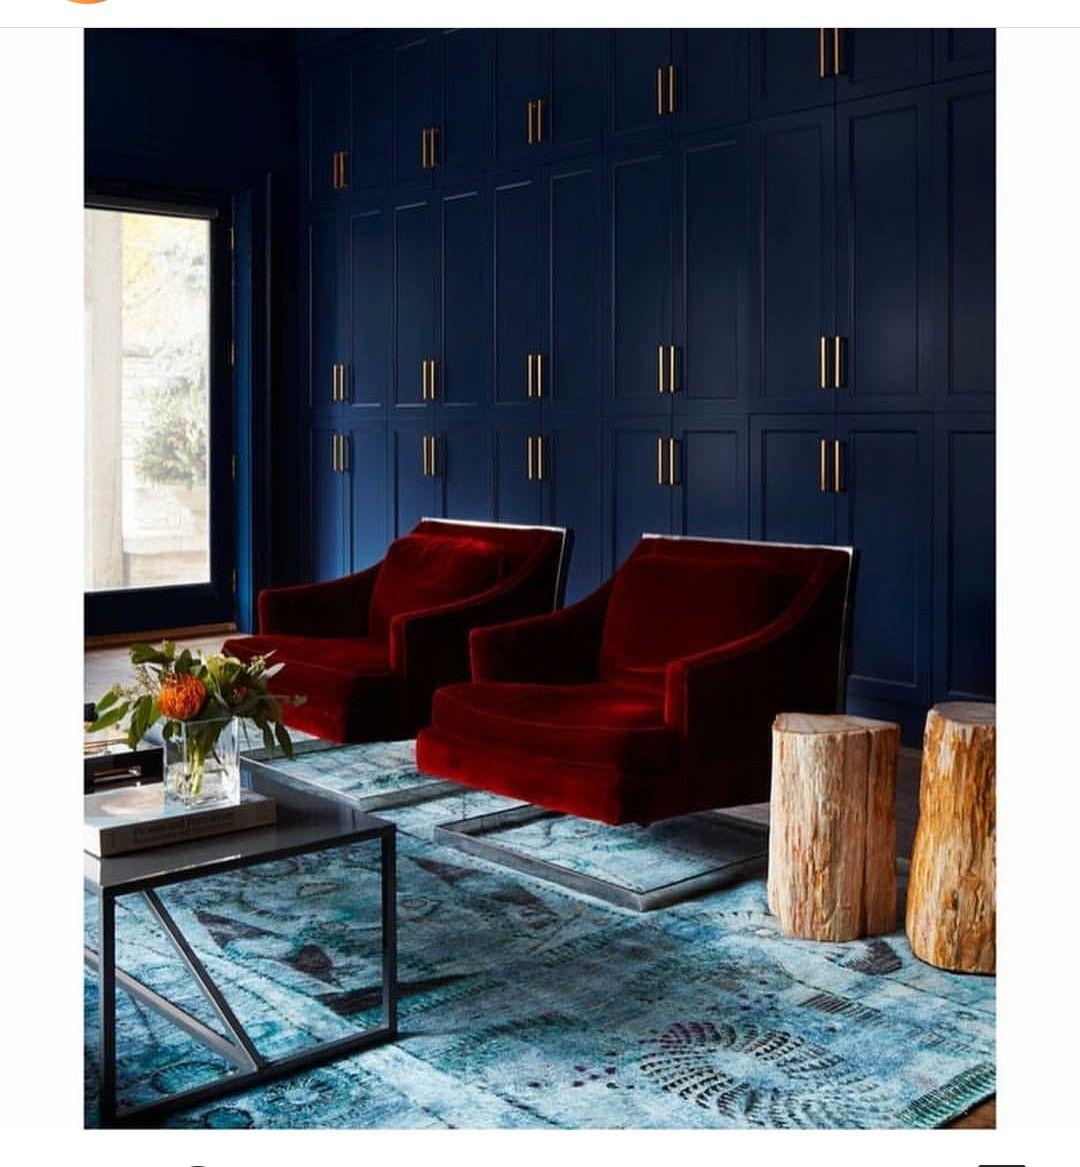 Pin von STYLE FILEZ REVIEW auf IDEAS FOR MY NEW HOUSE | Pinterest